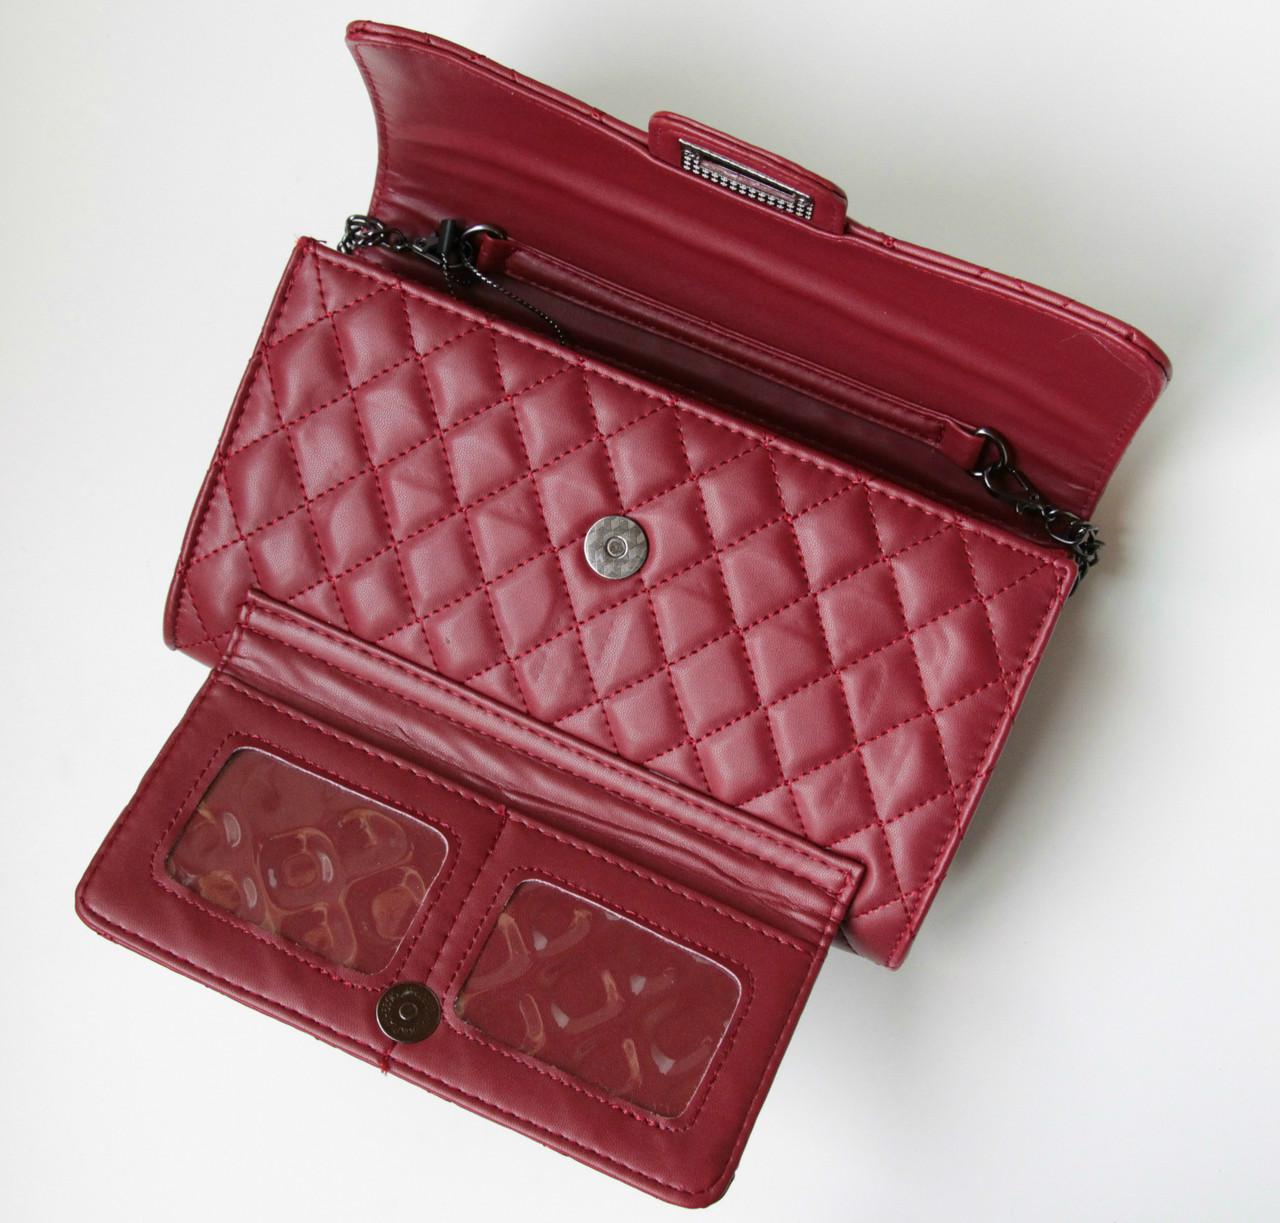 c8eab30d2f76 Женская сумка Flap mini бордовая 1023, сумка через плечо: продажа ...